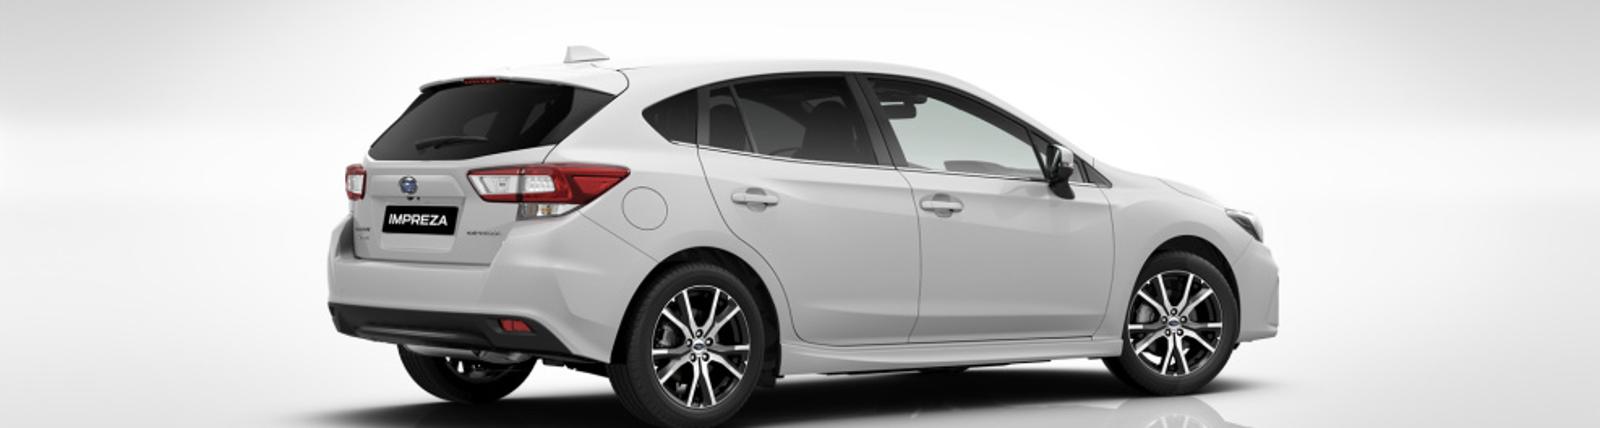 Trasera lateral Subaru impreza